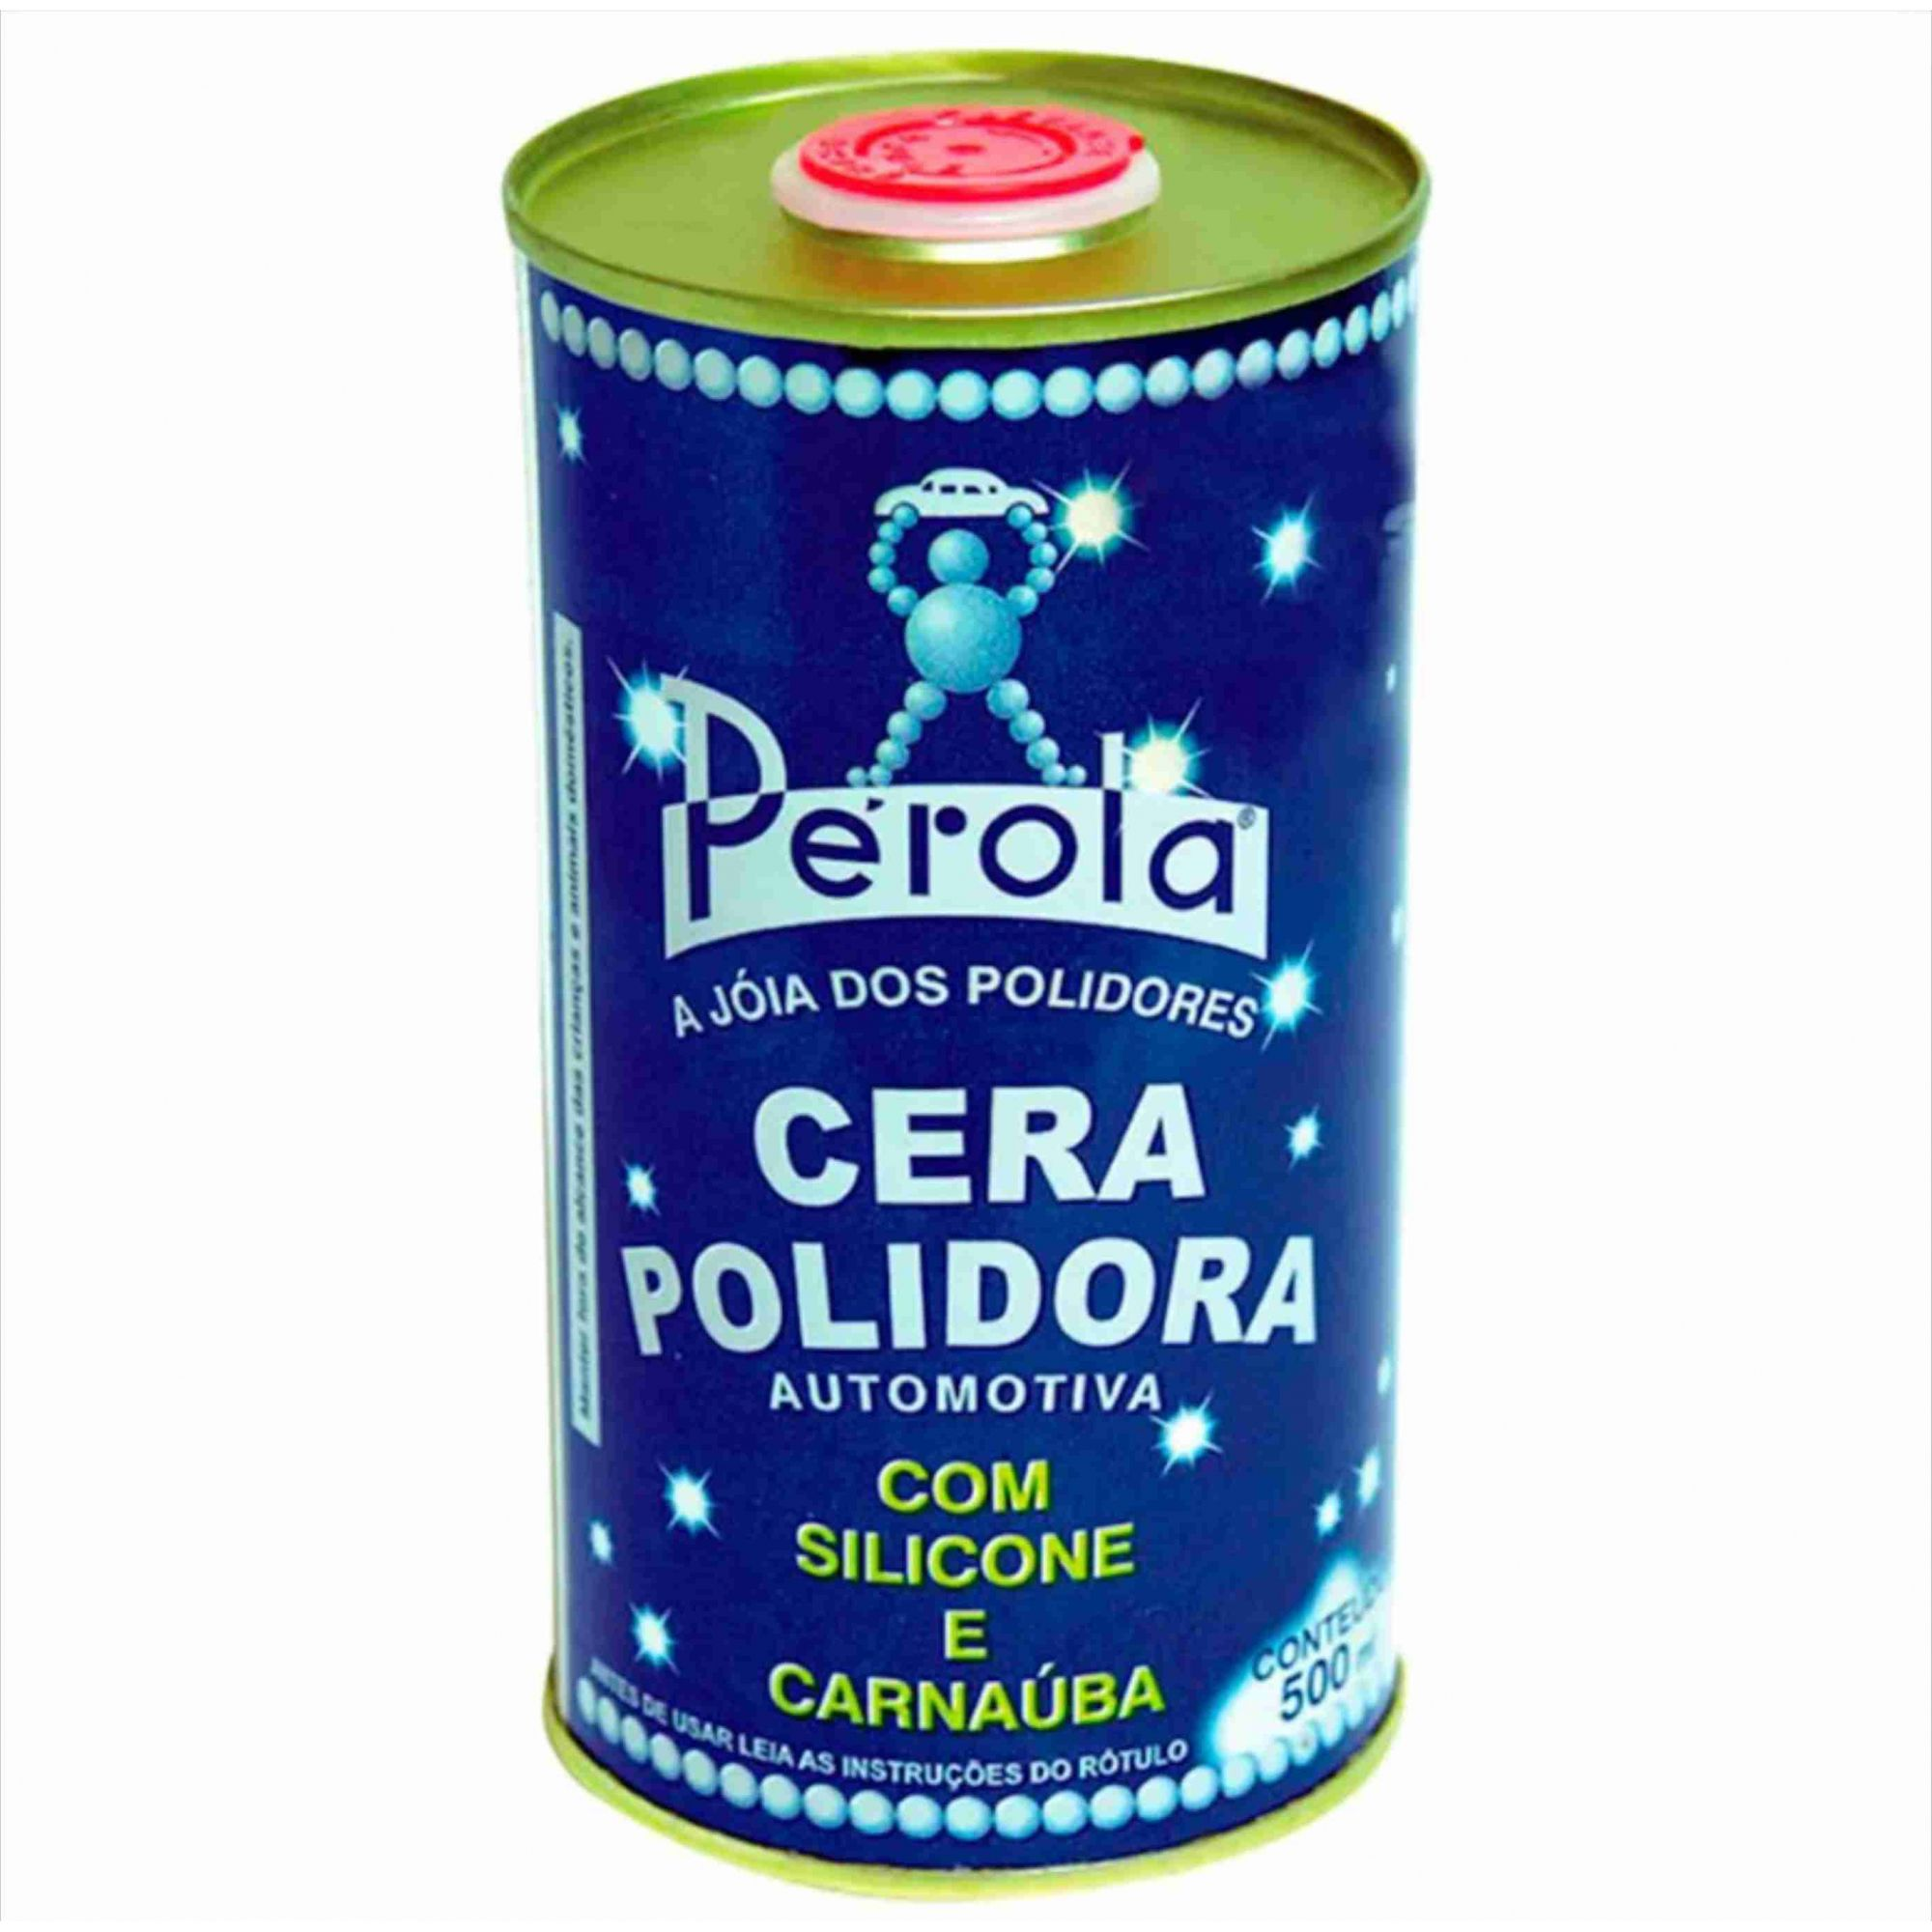 CERA POLIDORA + LUVA DE MICROFIBRA  - Rea Comércio - Sua Loja Completa!